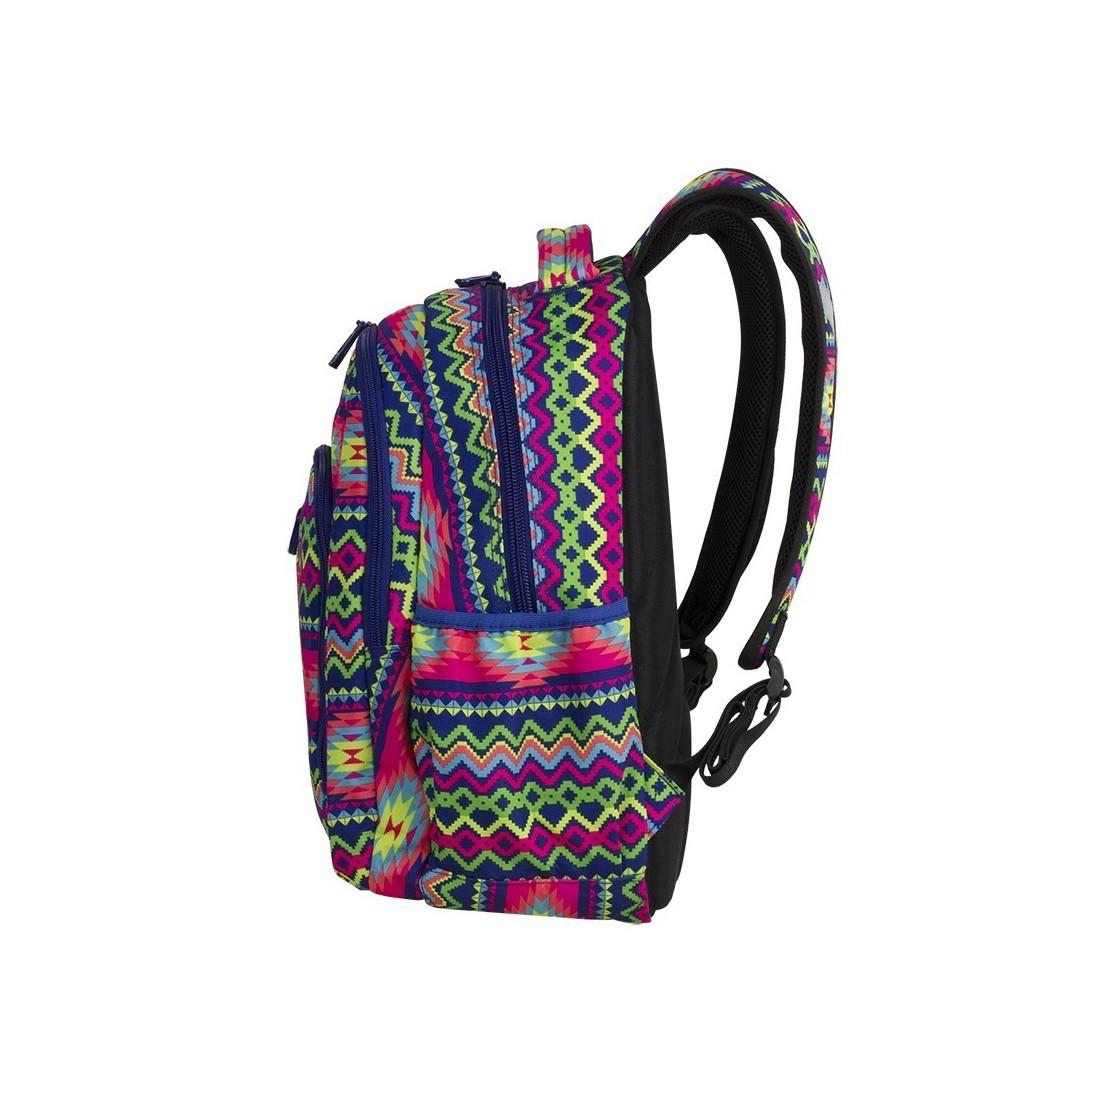 83164bf5c8a27 ... Plecak szkolny CoolPack CP STRIKE BOHO ELECTRA kolorowe zygzaki - 781+  GRATIS POMPON ...